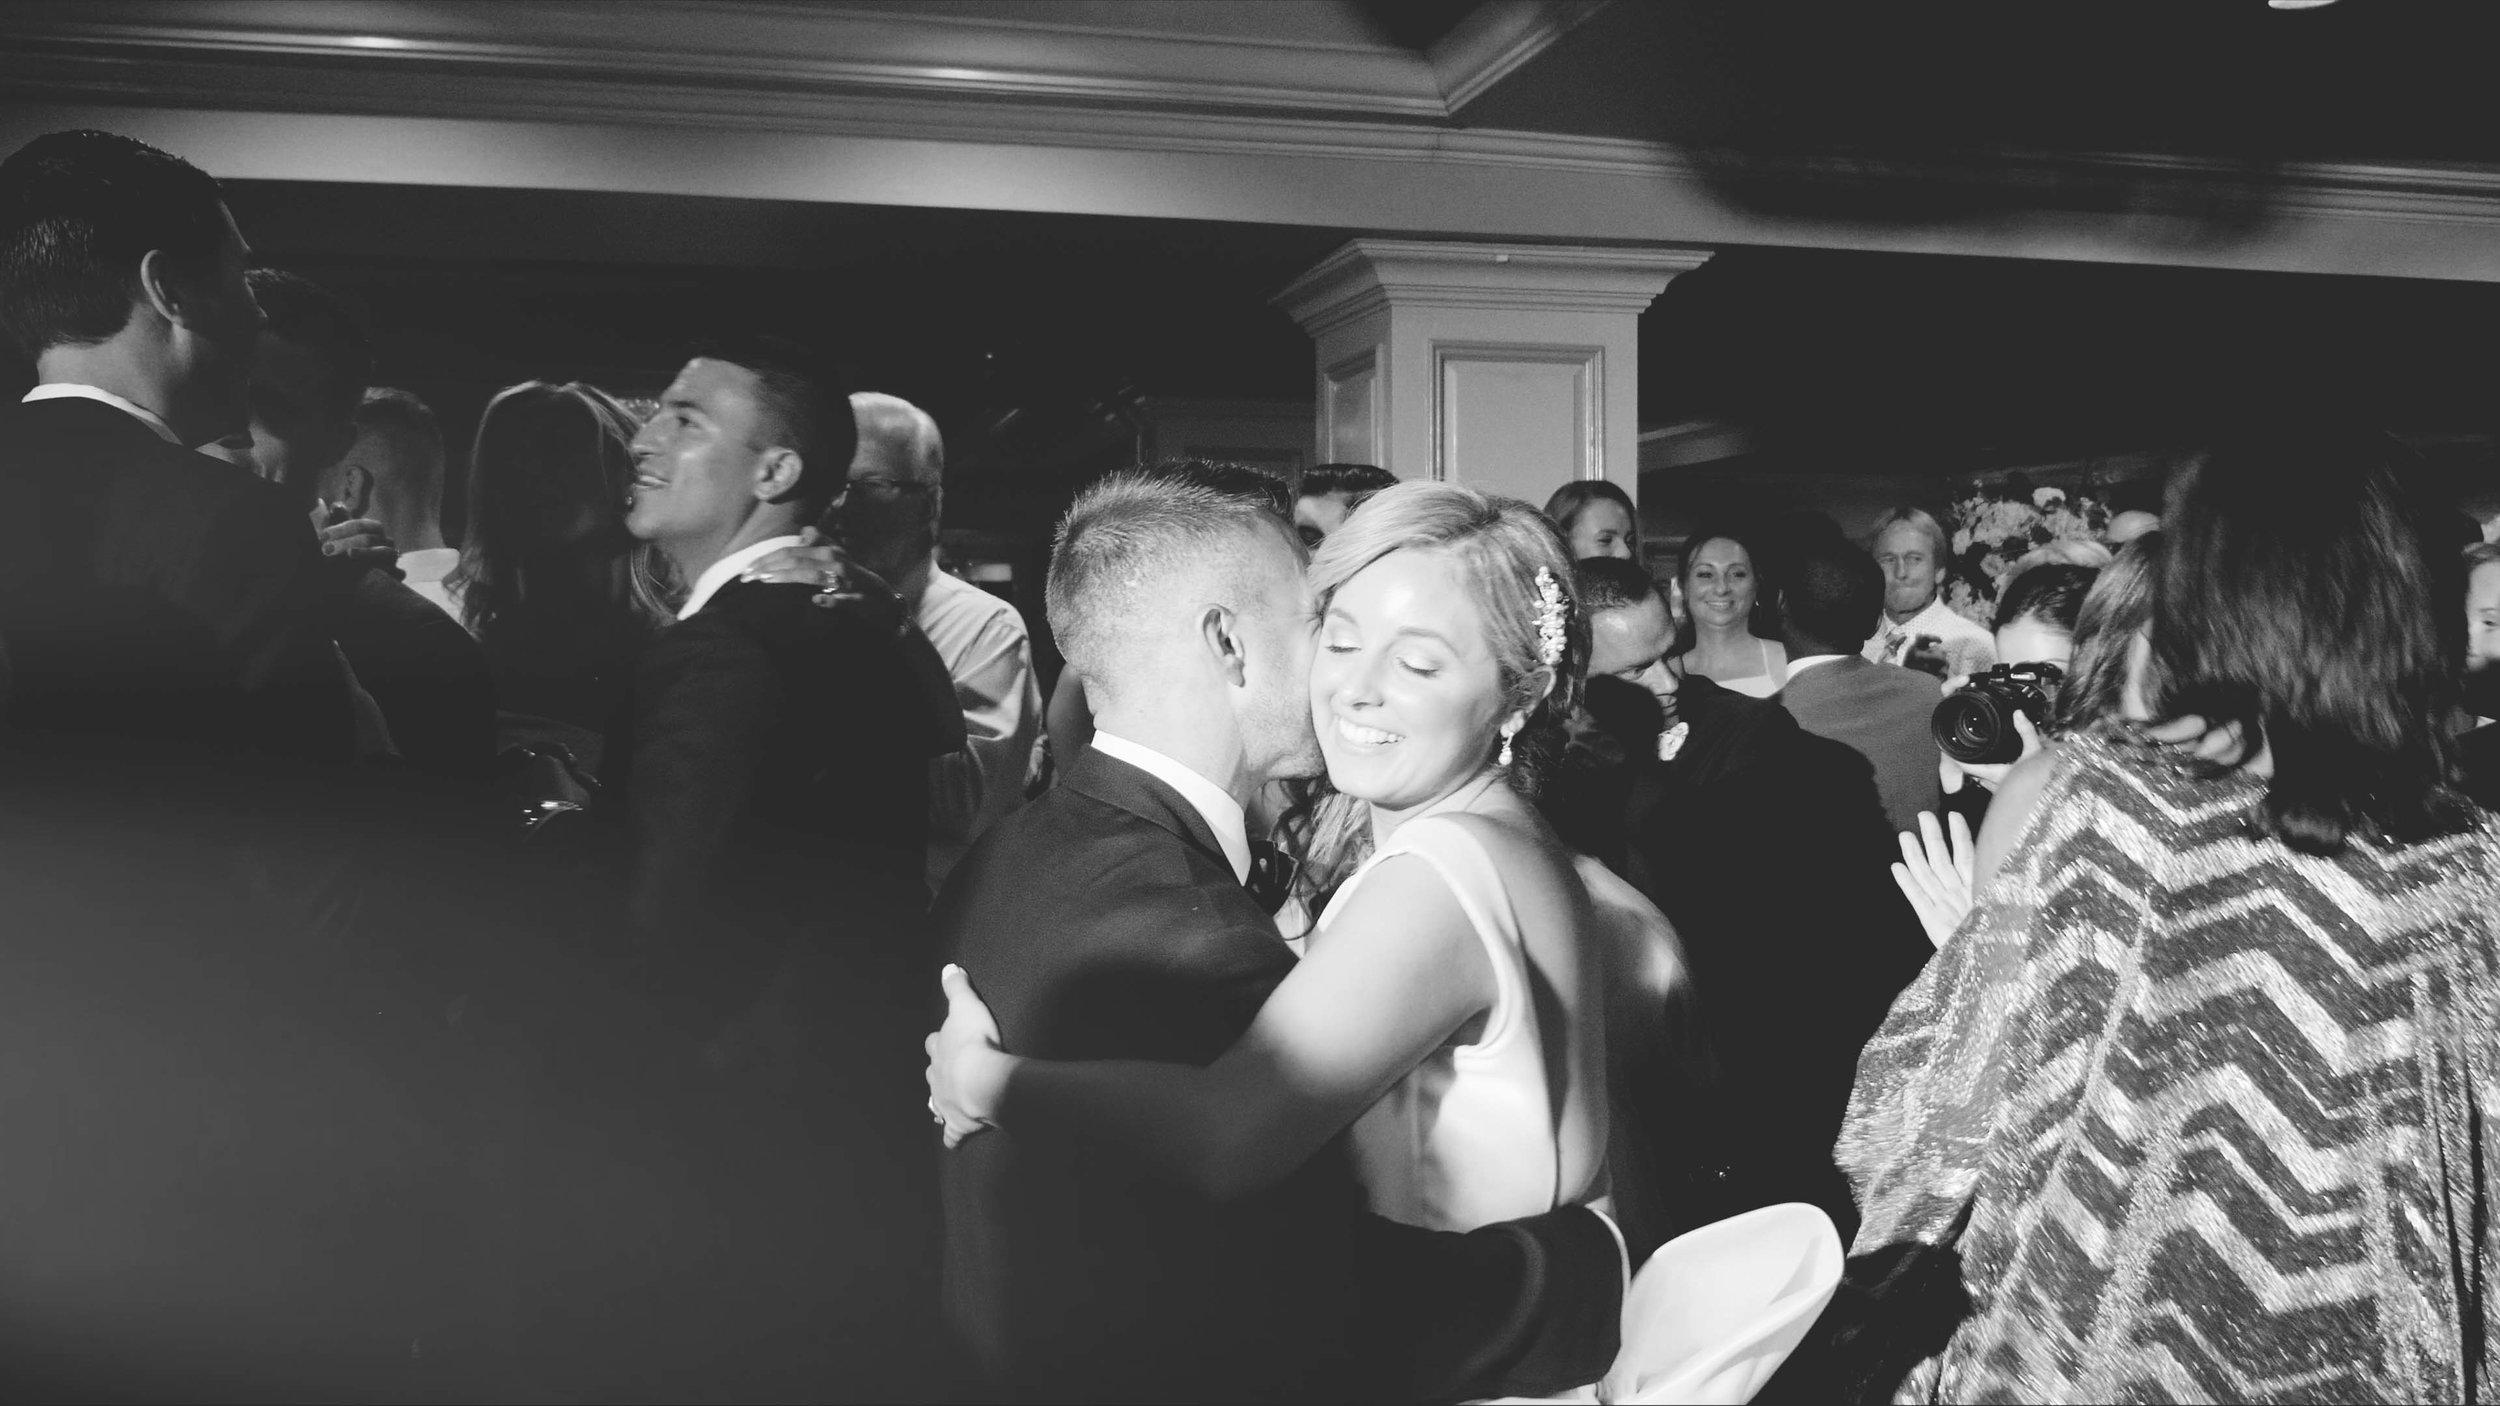 Tonemedia, NJ Wedding Videographer, NJ Wedding Videopgraphy, NJ Wedding Video, Olde Mill Inn Wedding, Olde Mill Inn, The Olde Mill Inn Wedding, Olde Mill Inn Wedding Videographer,The Olde Mill Inn, The Olde Mill Inn Wedding, The Olde Mill Inn Wedding Video